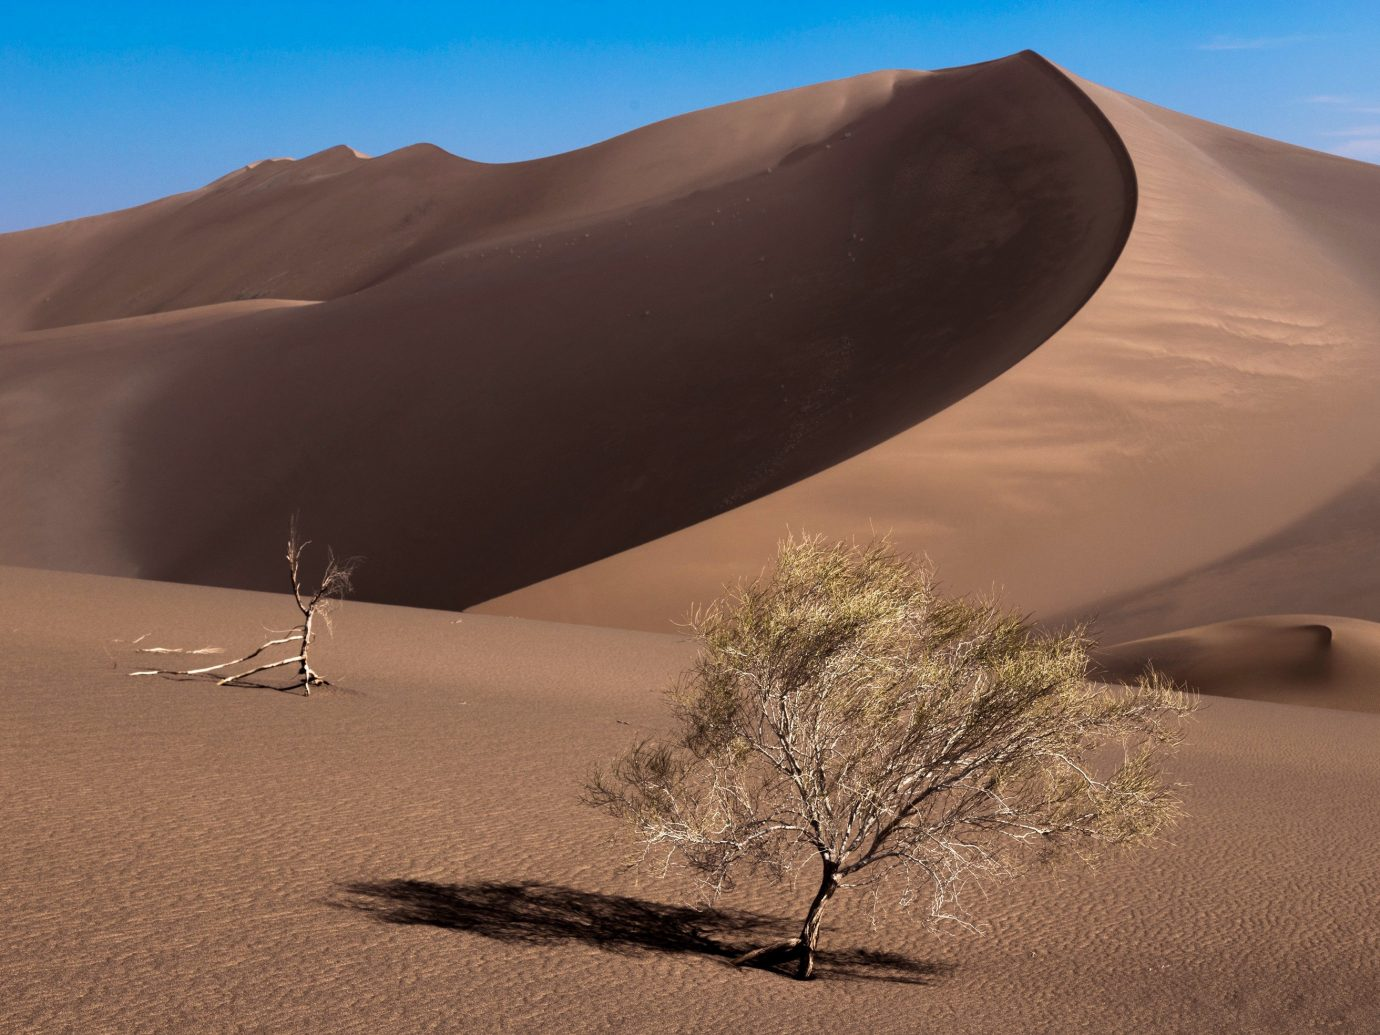 Trip Ideas sky Nature habitat erg geographical feature natural environment outdoor landform aeolian landform Desert sand mountain dune sahara landscape wadi plateau material day